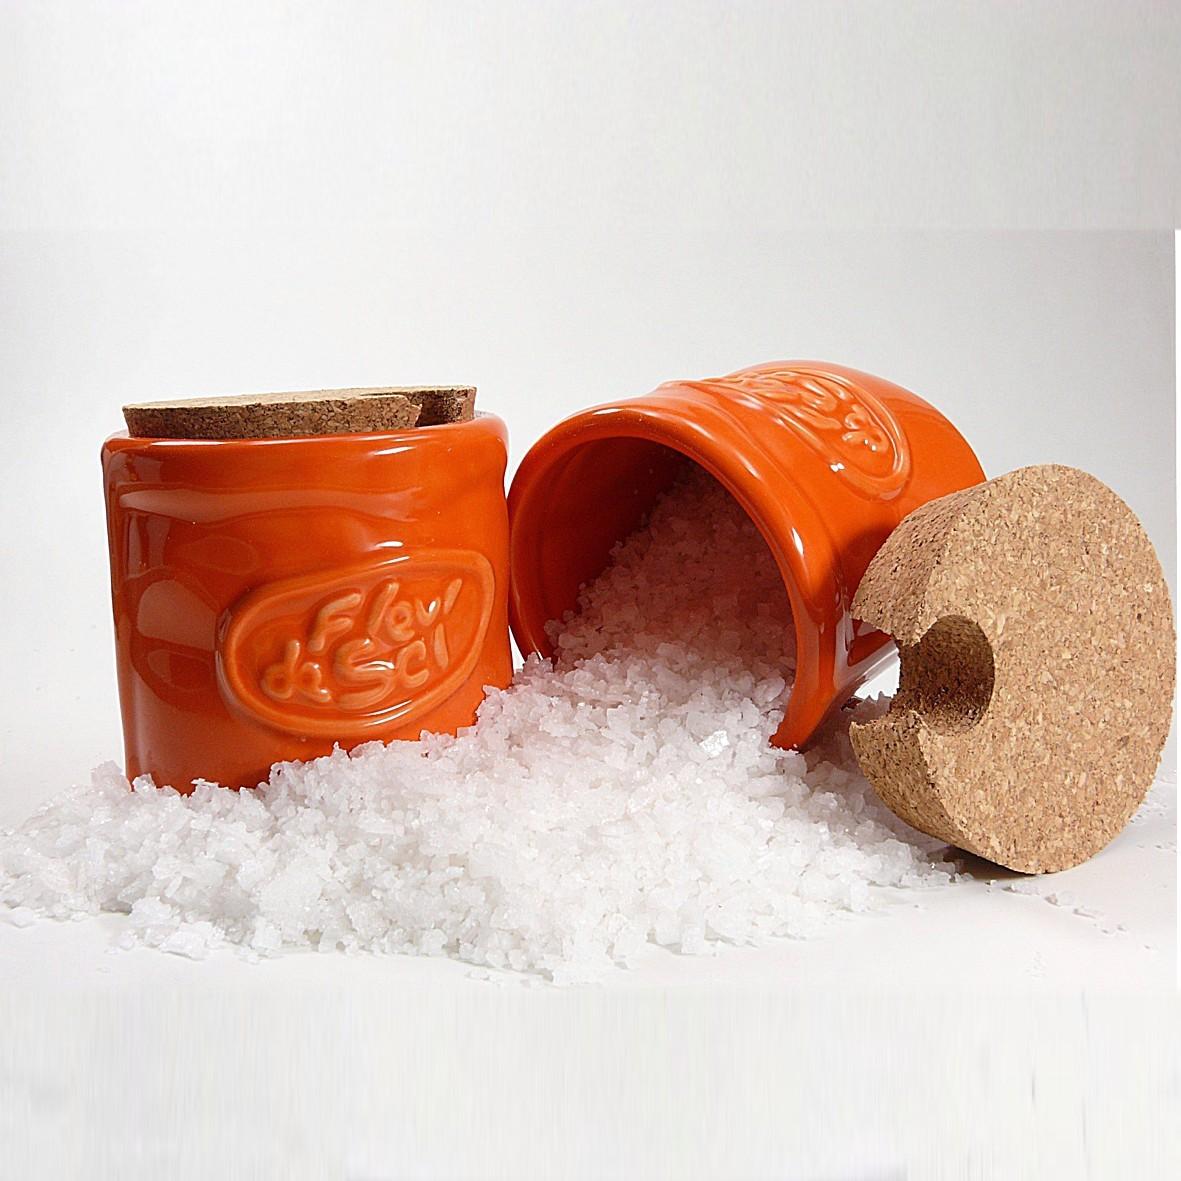 salzpot fleur de sel in orange inklusive 1 holzsch ufelchen. Black Bedroom Furniture Sets. Home Design Ideas